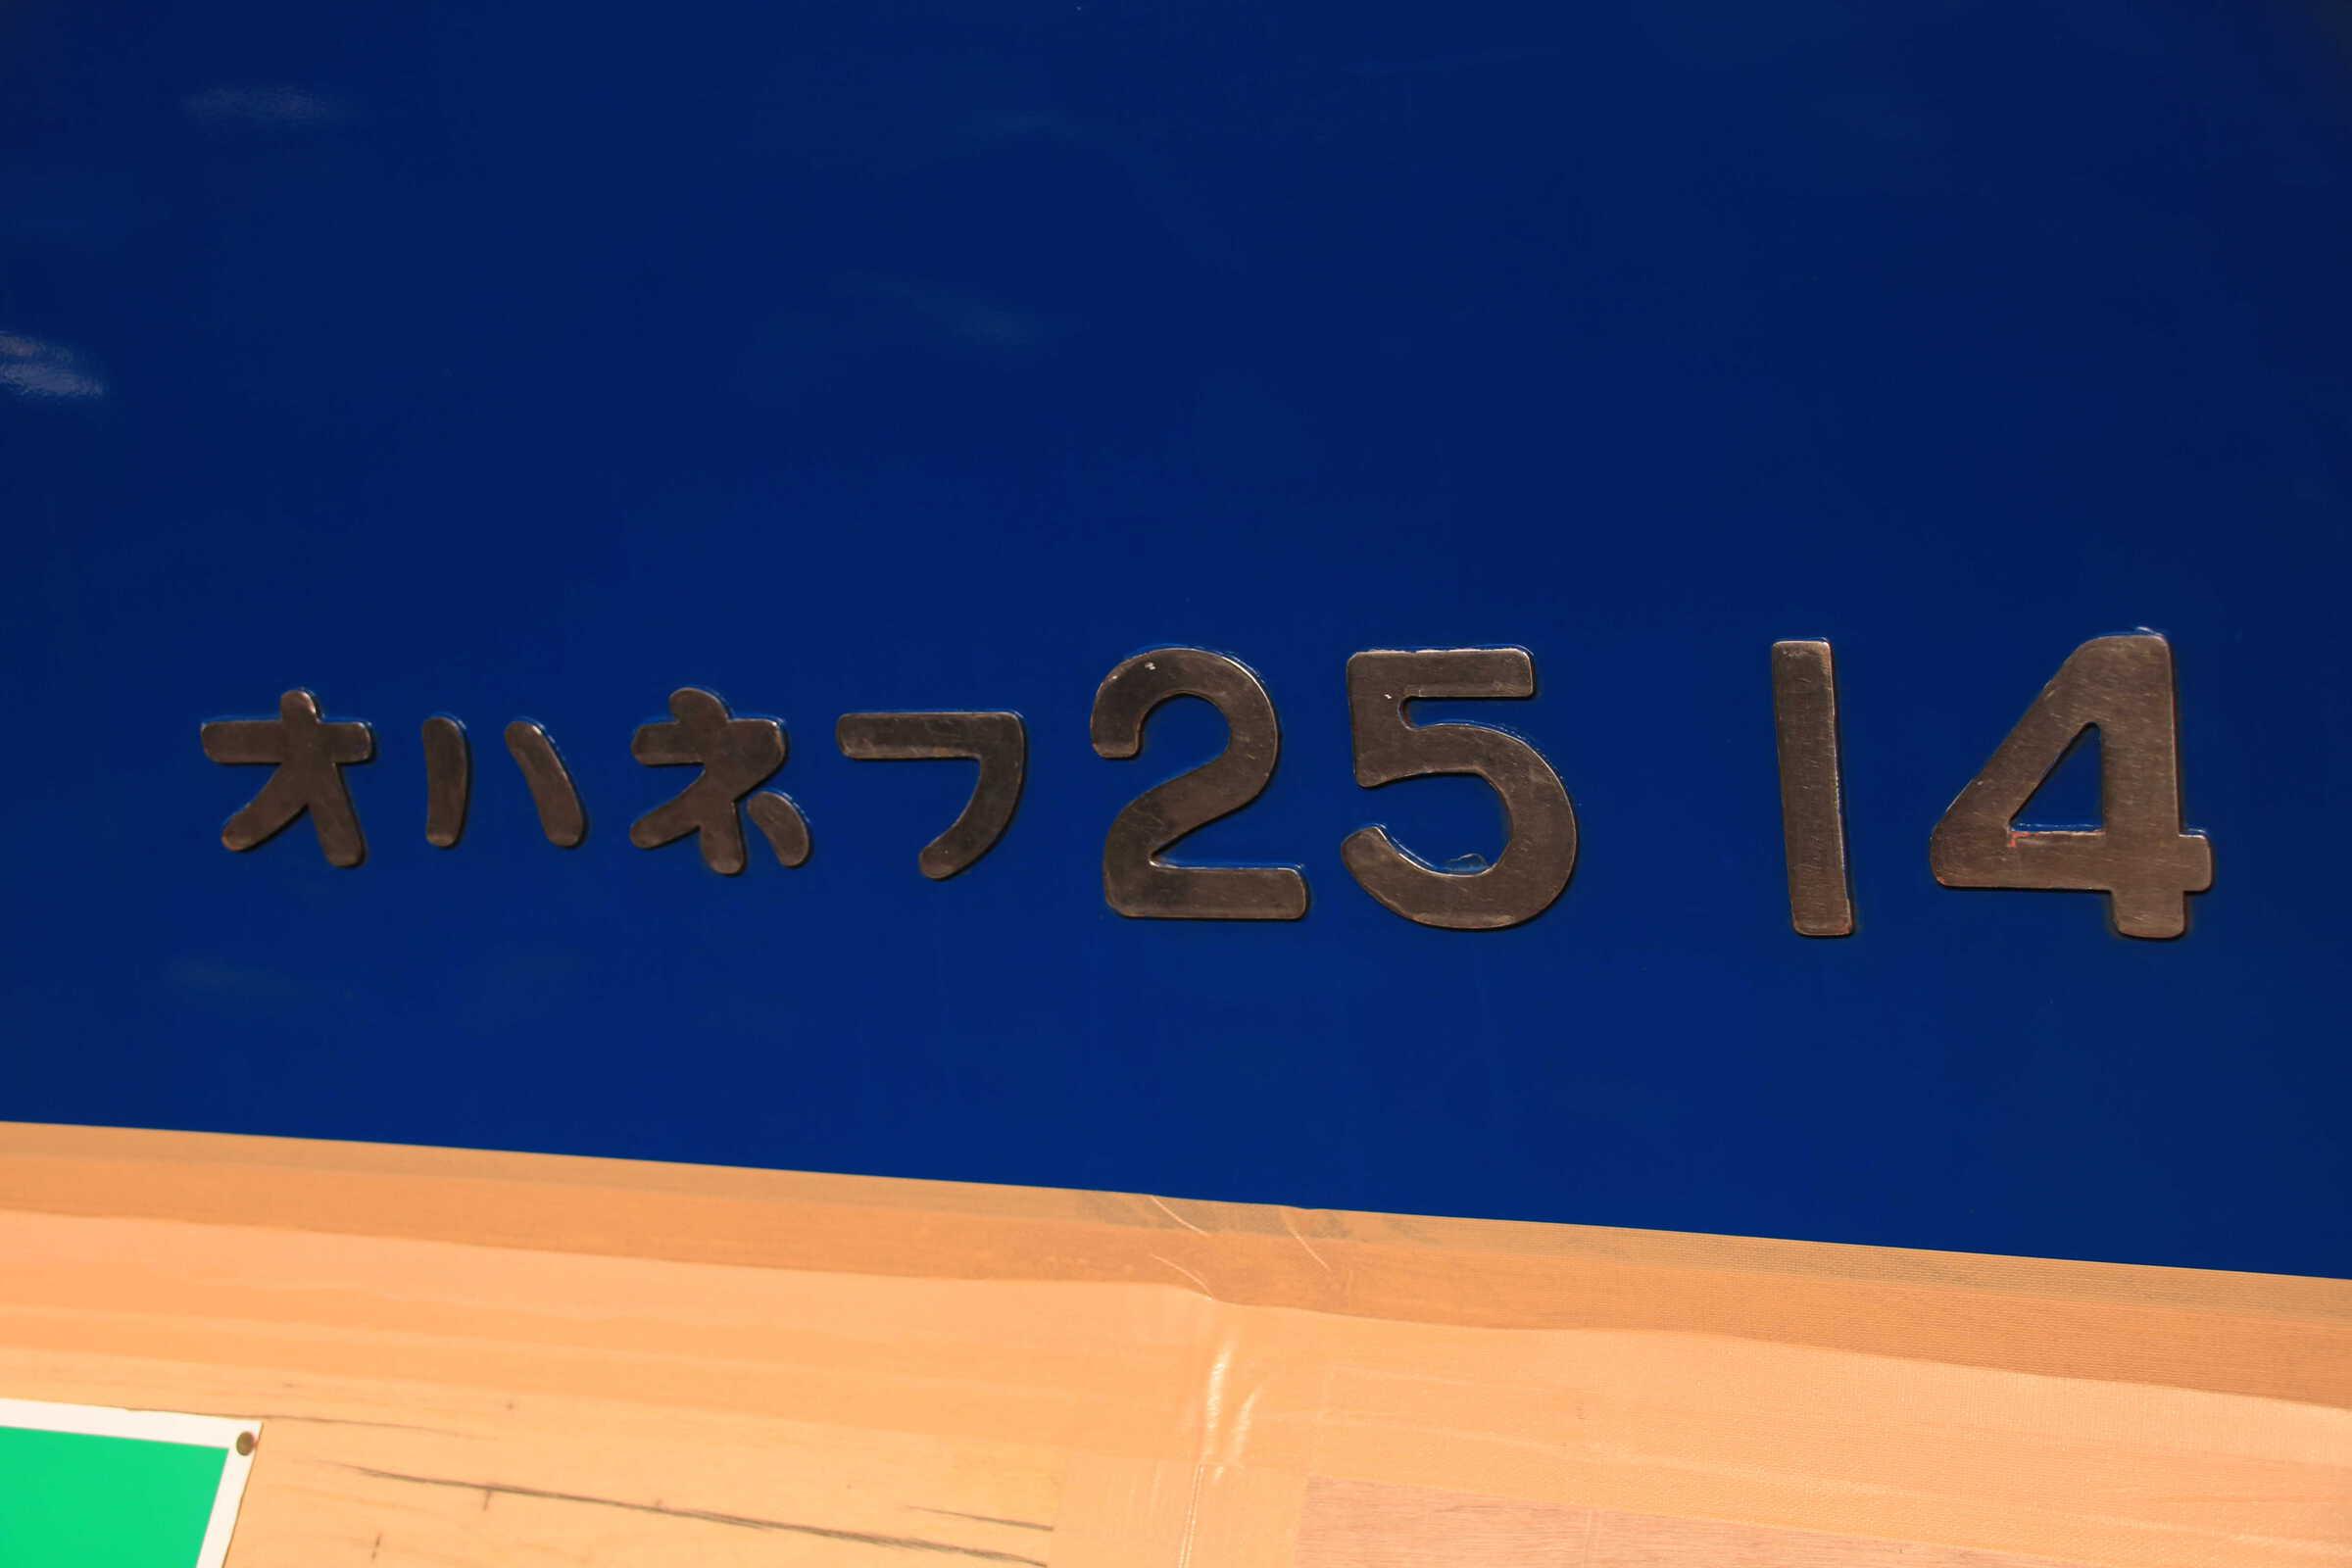 北斗星24系 ドア開閉体験